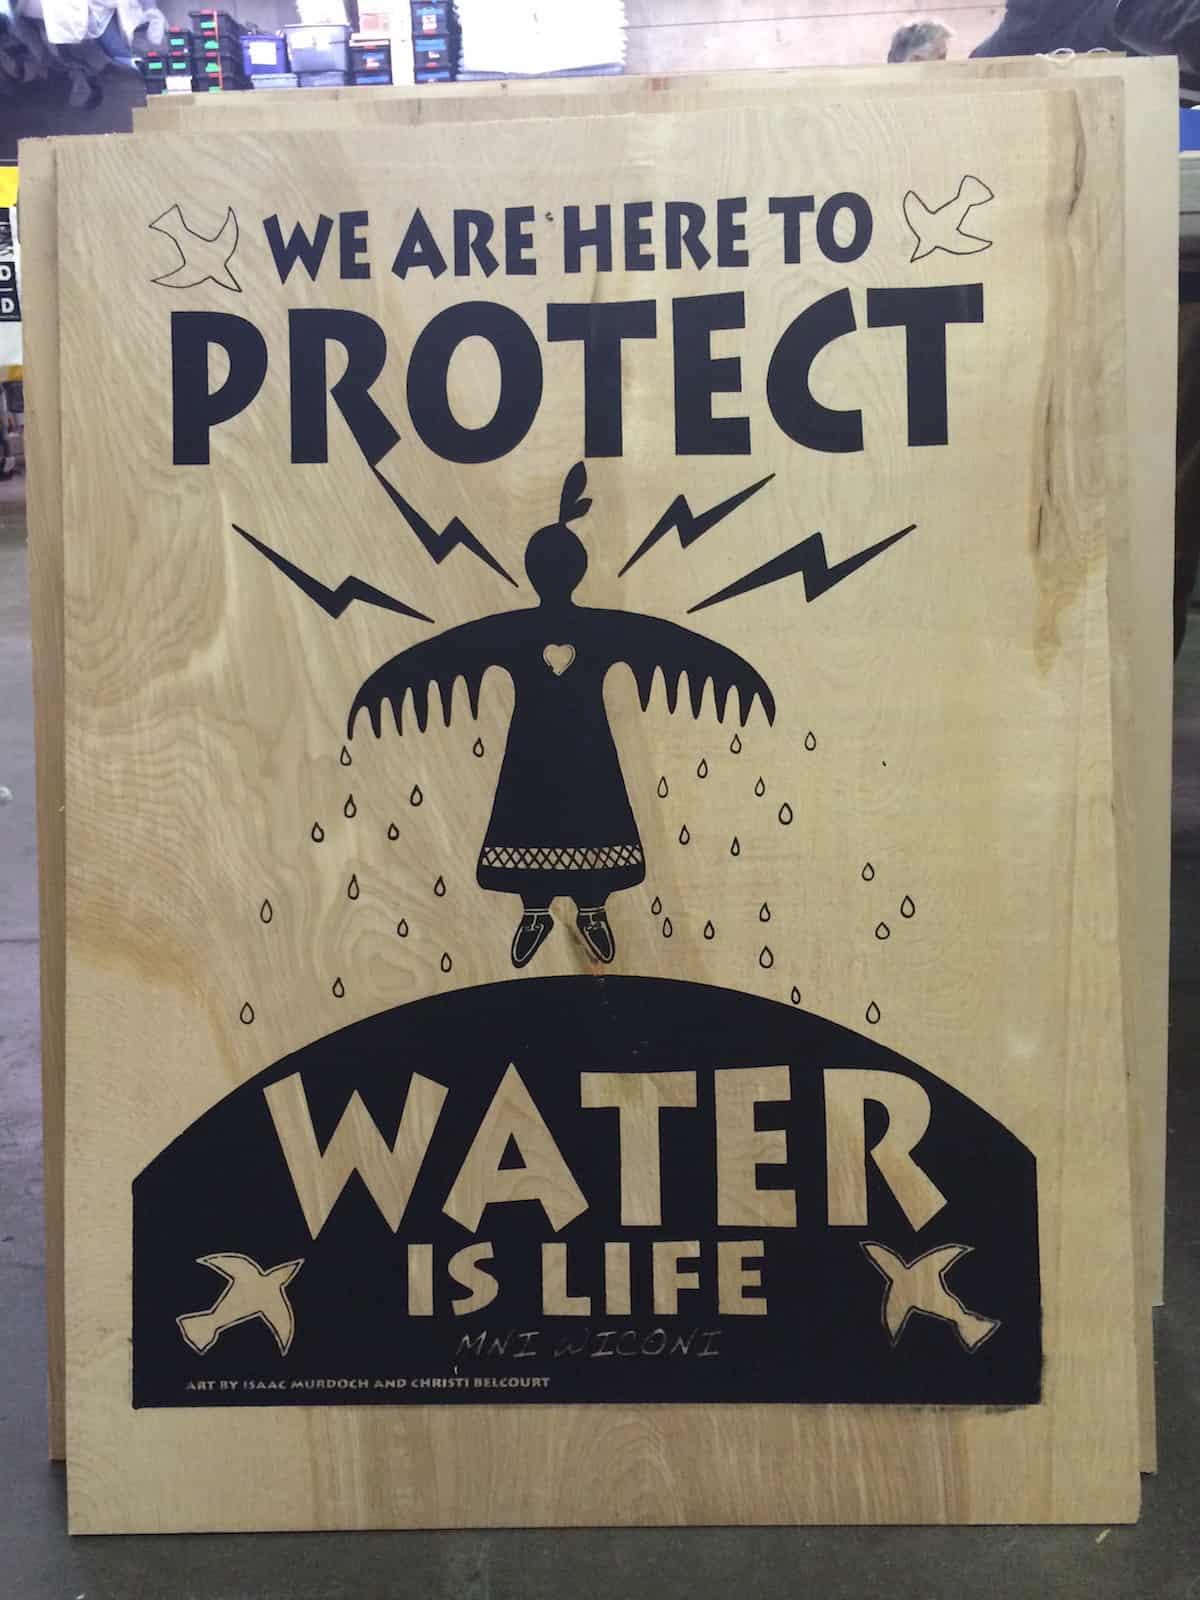 Dignidad Rebelde woodblock print at the Oakland Art Build for Standing Rock. (Photo: Nadya Tannous)